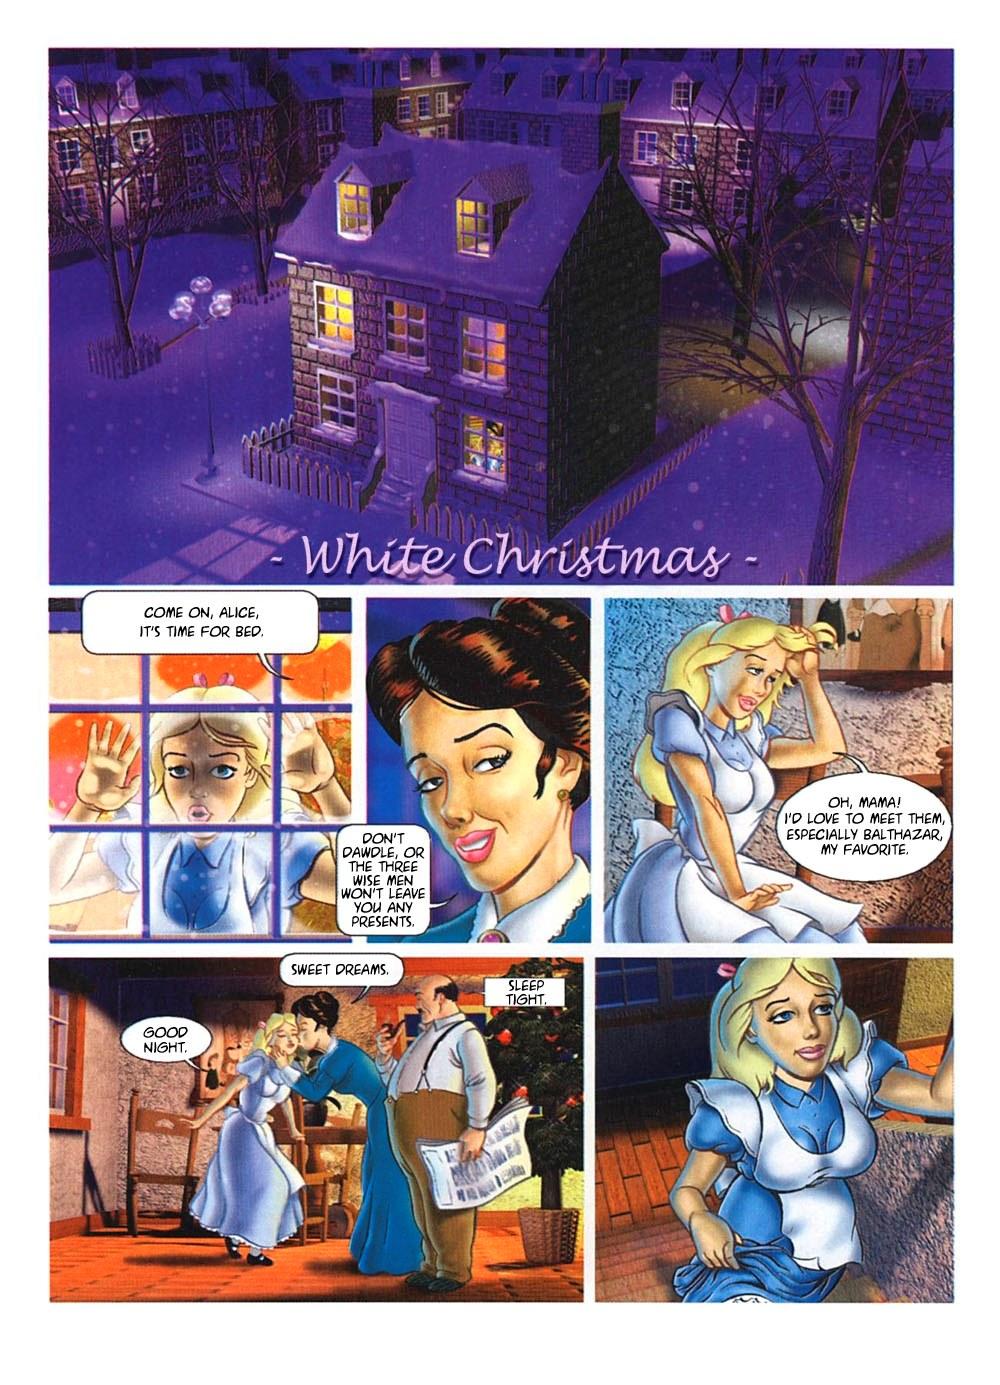 SureFap xxx porno Alice in Wonderland - [Paco Roca] - White Christmas + Cut Versions